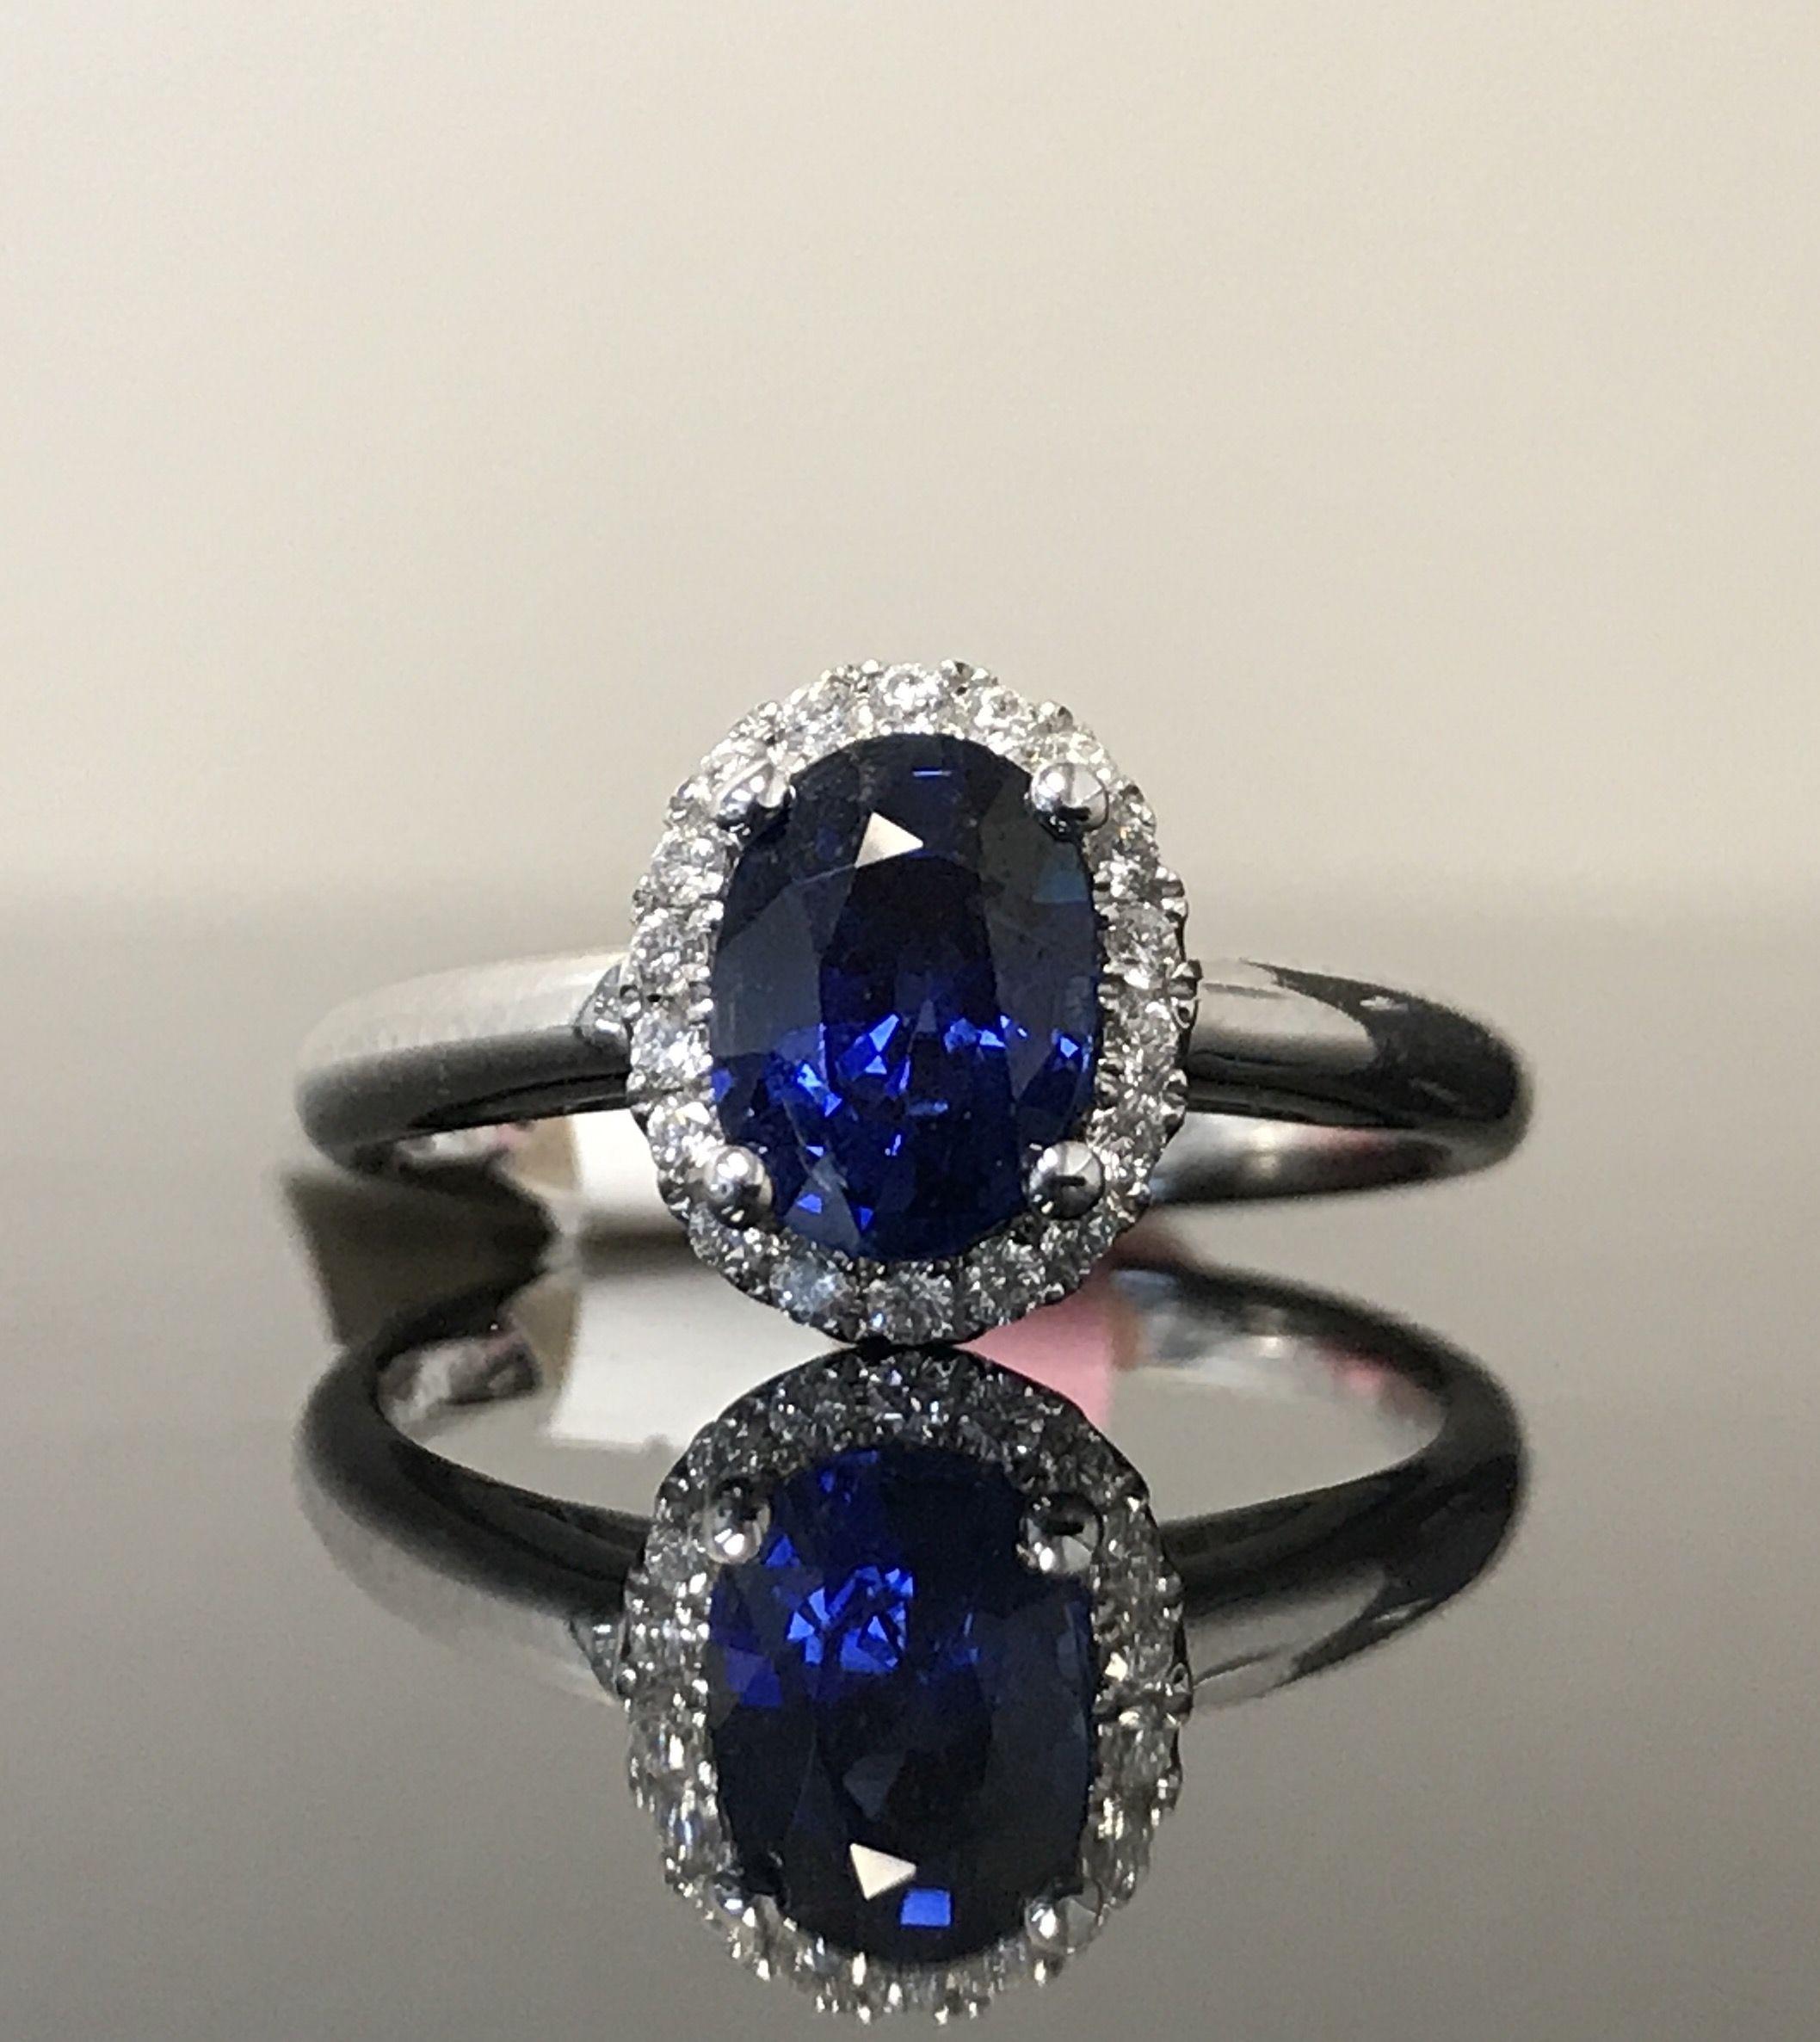 Pin by Wilson Diamond Brokers on Jewelry Jewelry, Heart